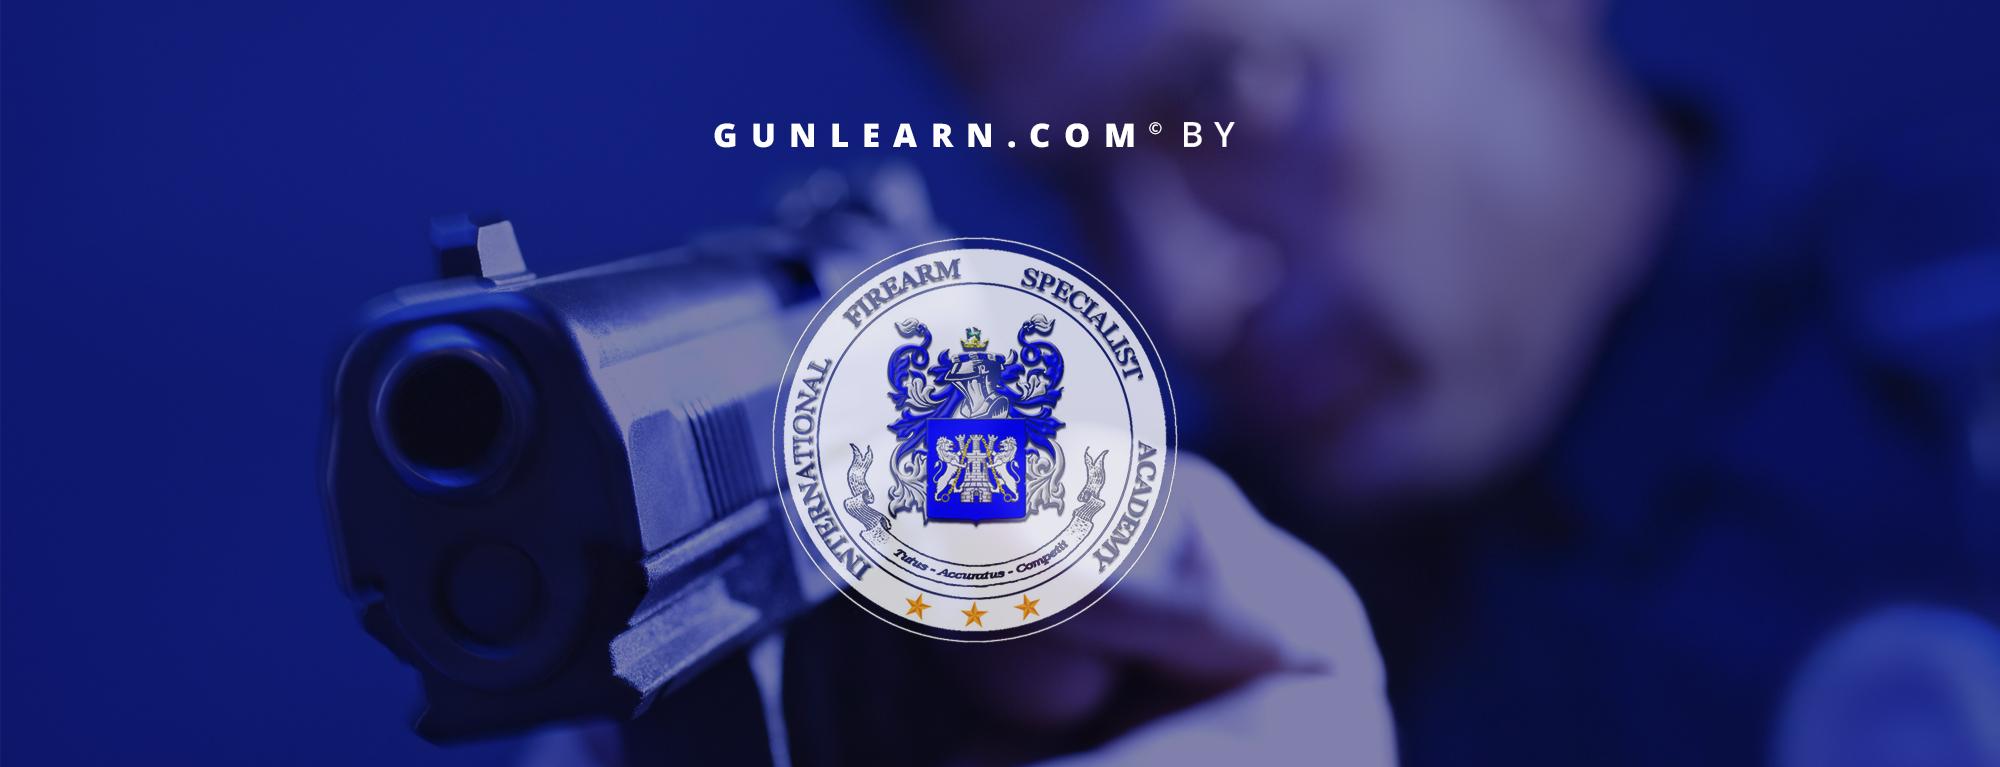 gunlearn-slider